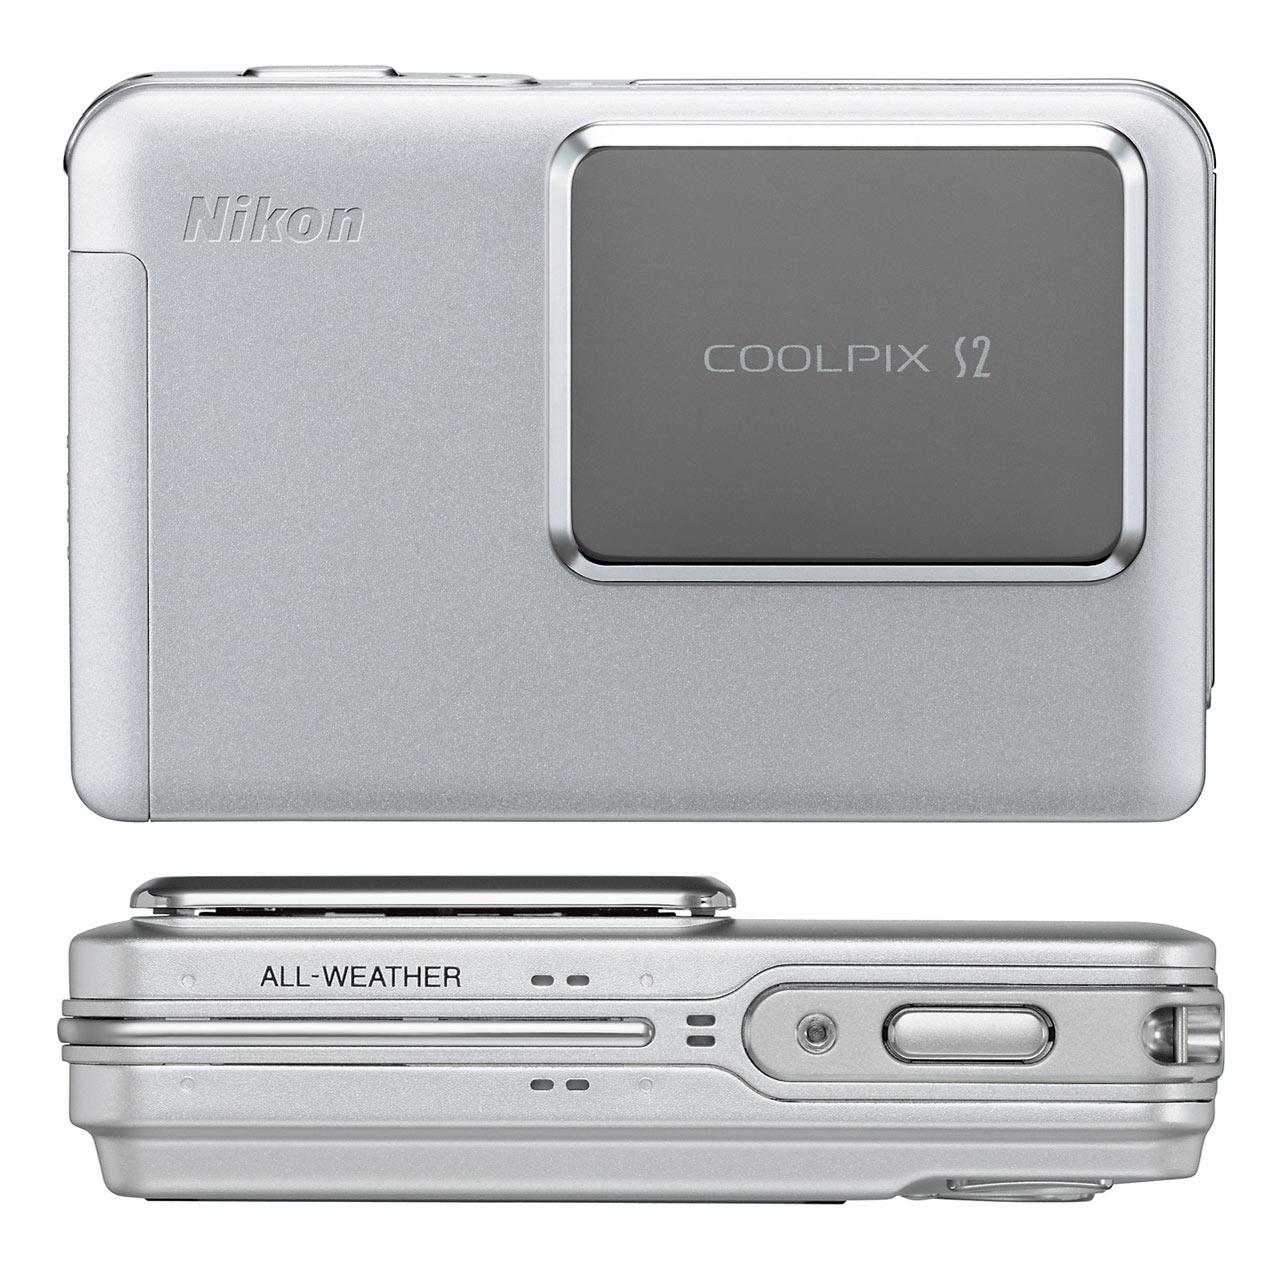 nikon coolpix s2 digital photography review rh dpreview com nikon coolpix s220 manual download nikon coolpix s02 user manual